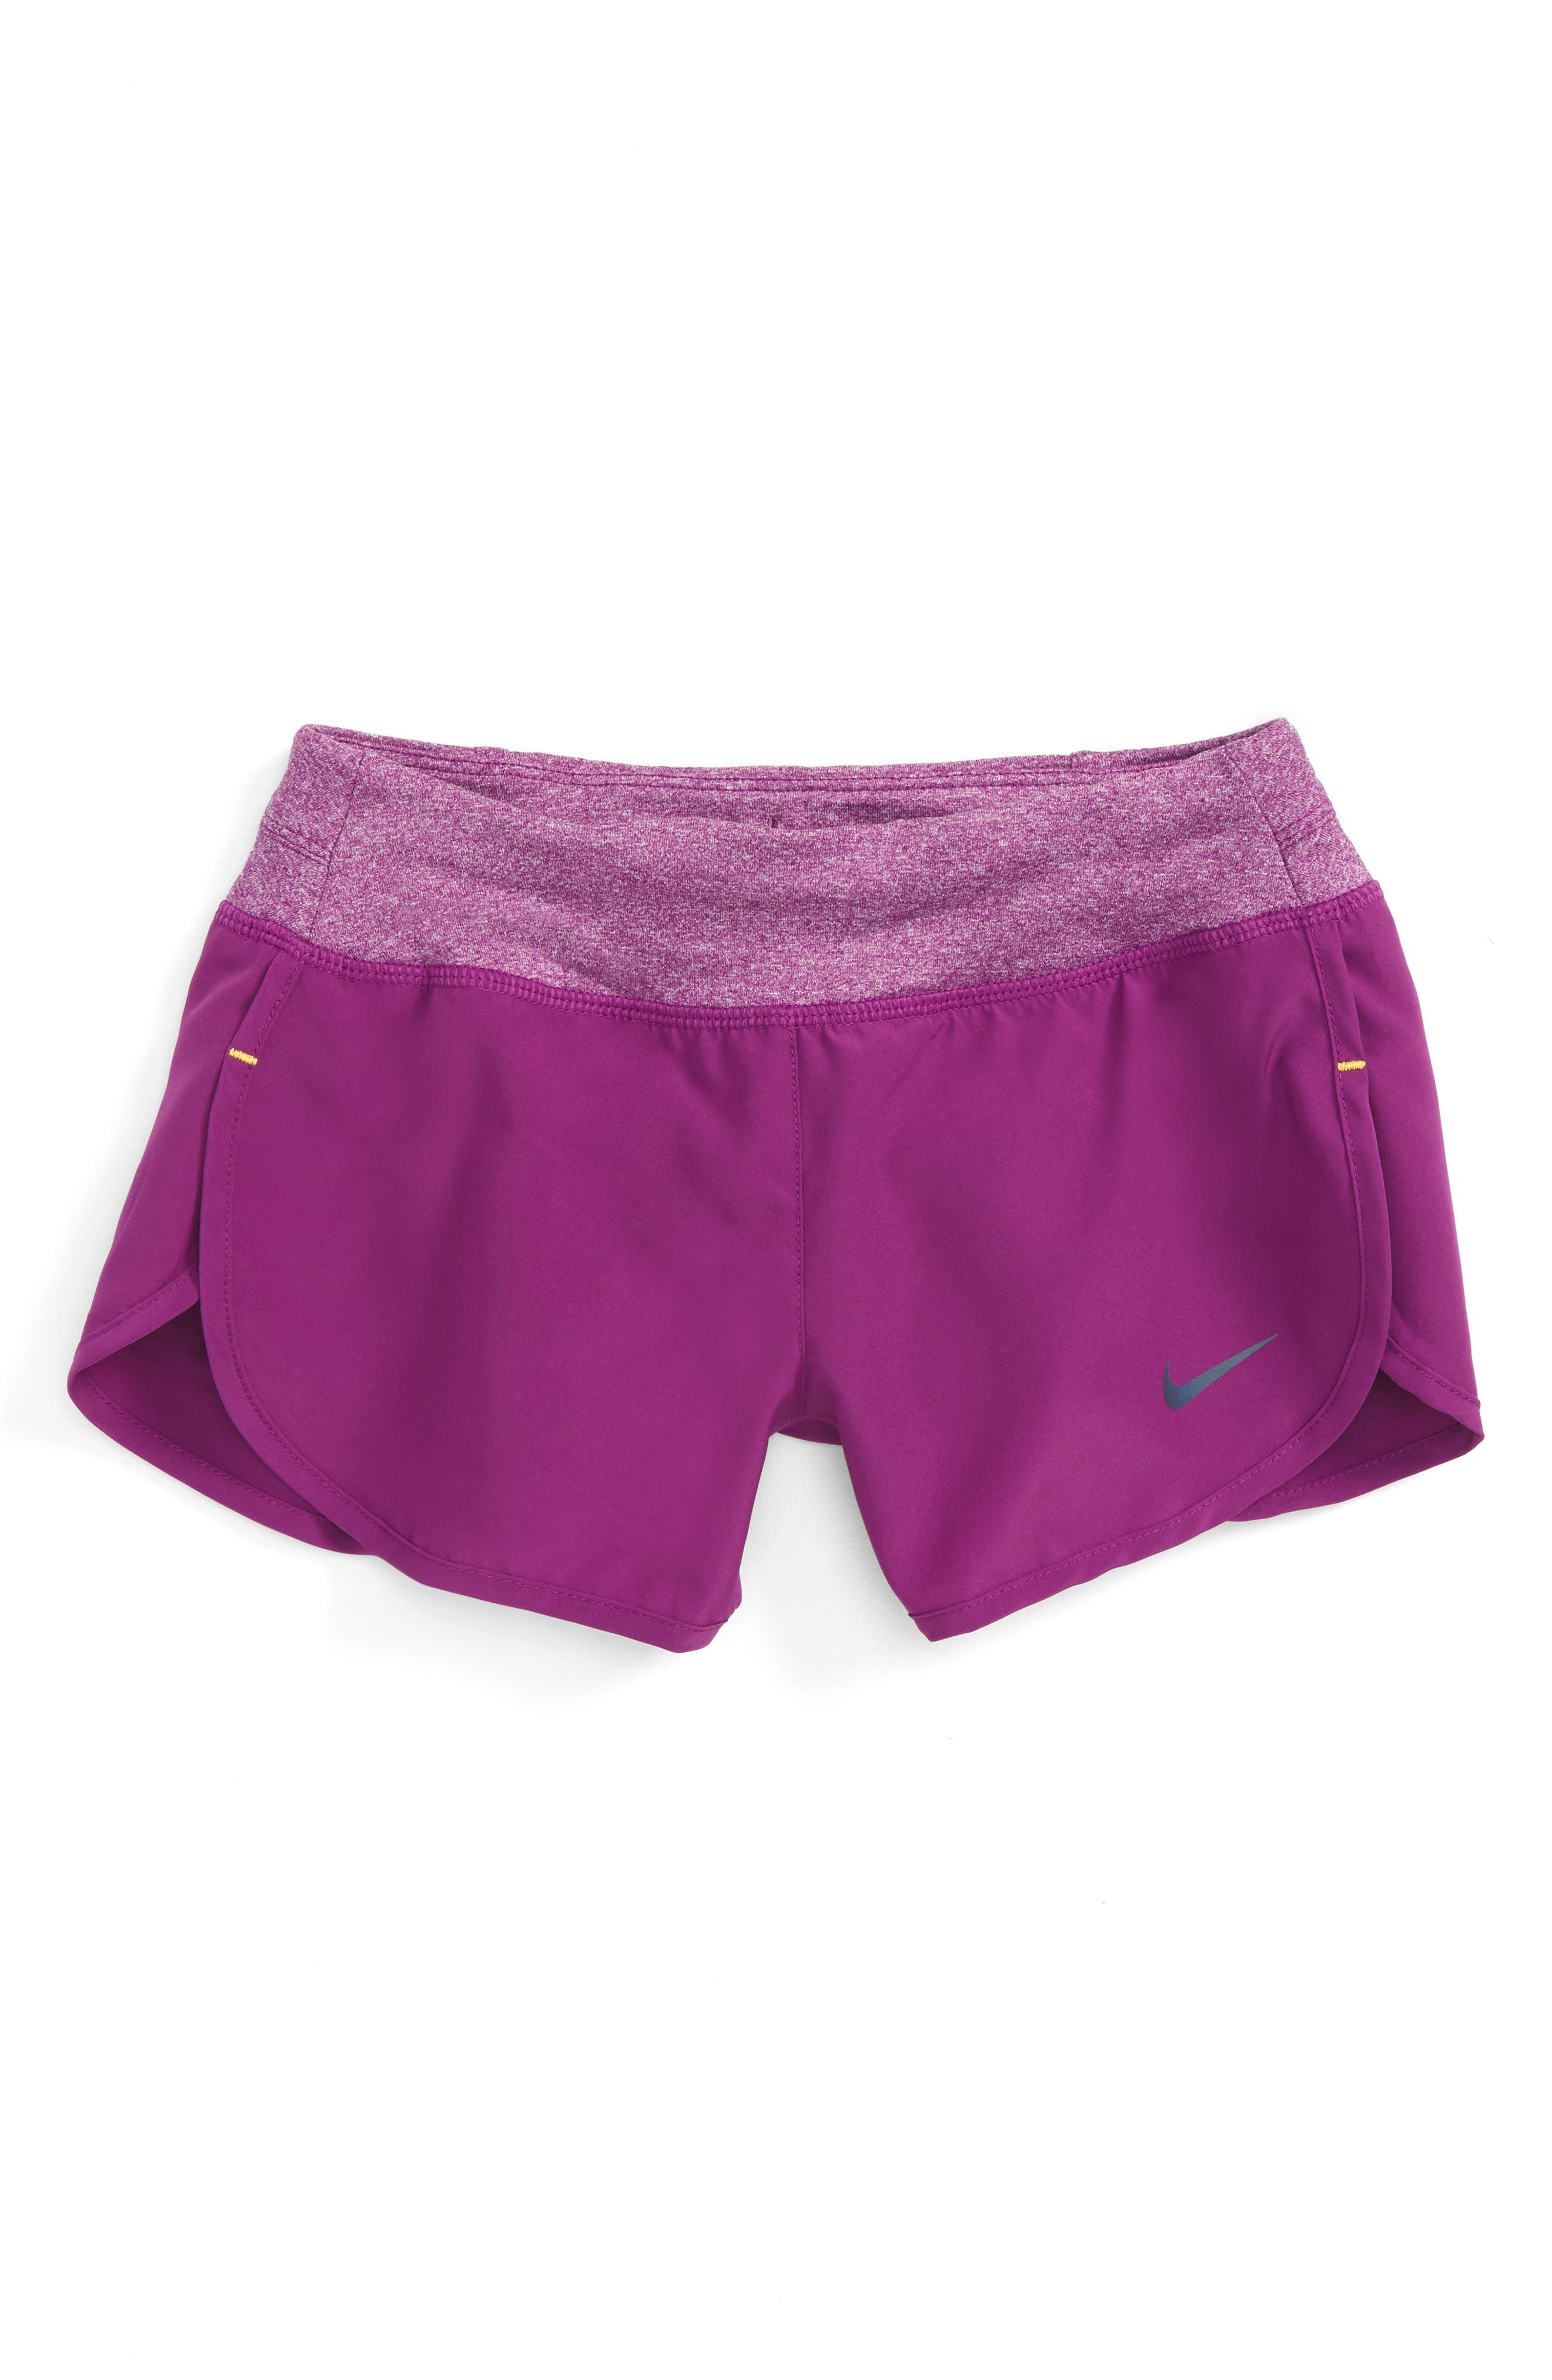 'Rival' Dri-FIT Shorts,                             Main thumbnail 1, color,                             550